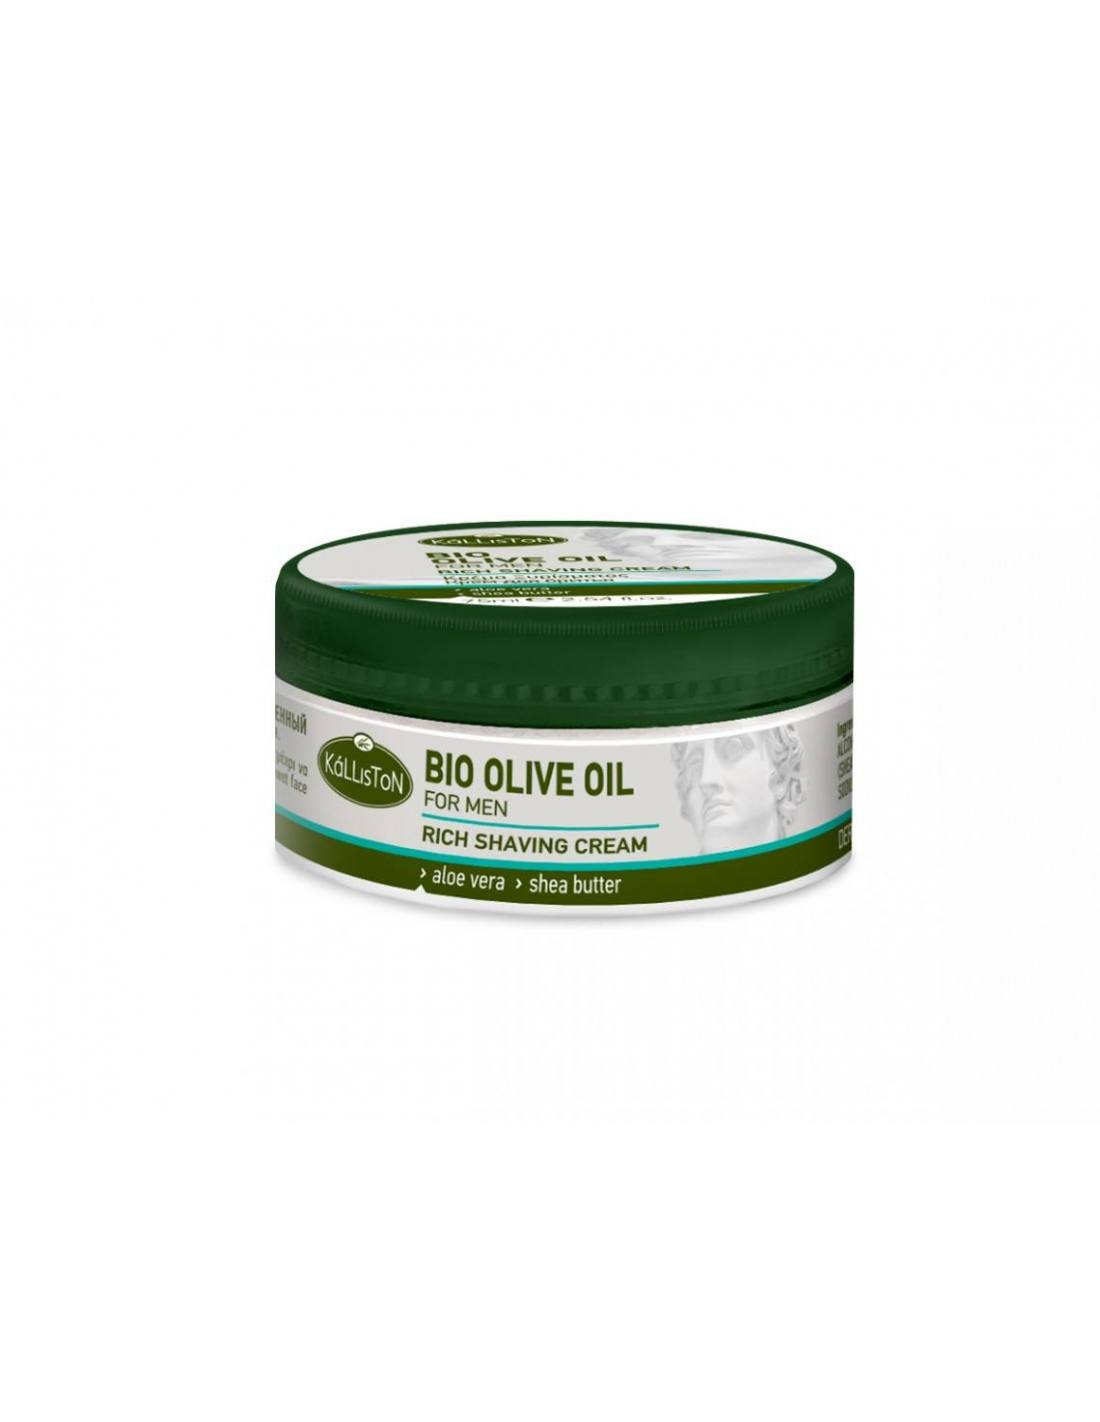 kaliston-rich-shaving-cream-with-aloe-shea-butter-100ml.jpg